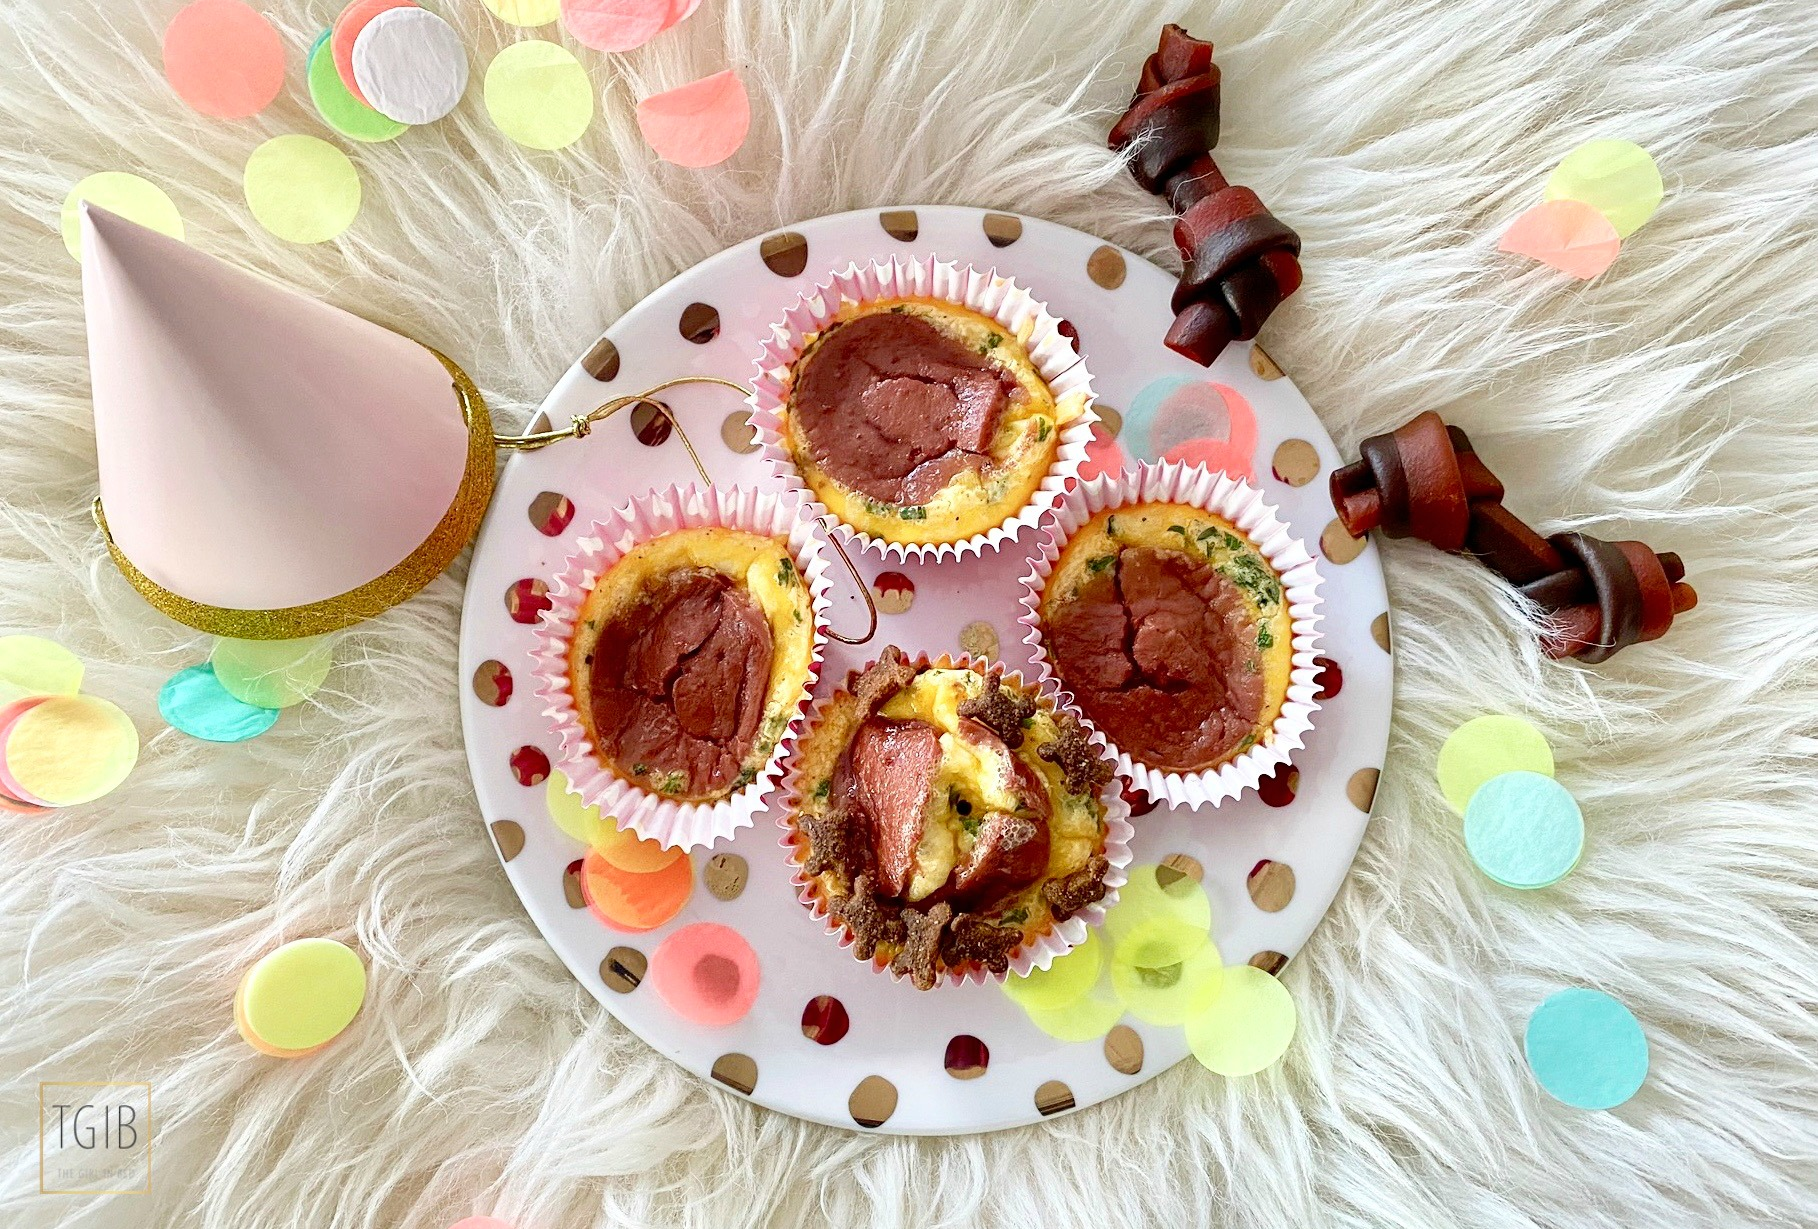 Super Makkelijke Pupcakes hondencupcake ei muffin